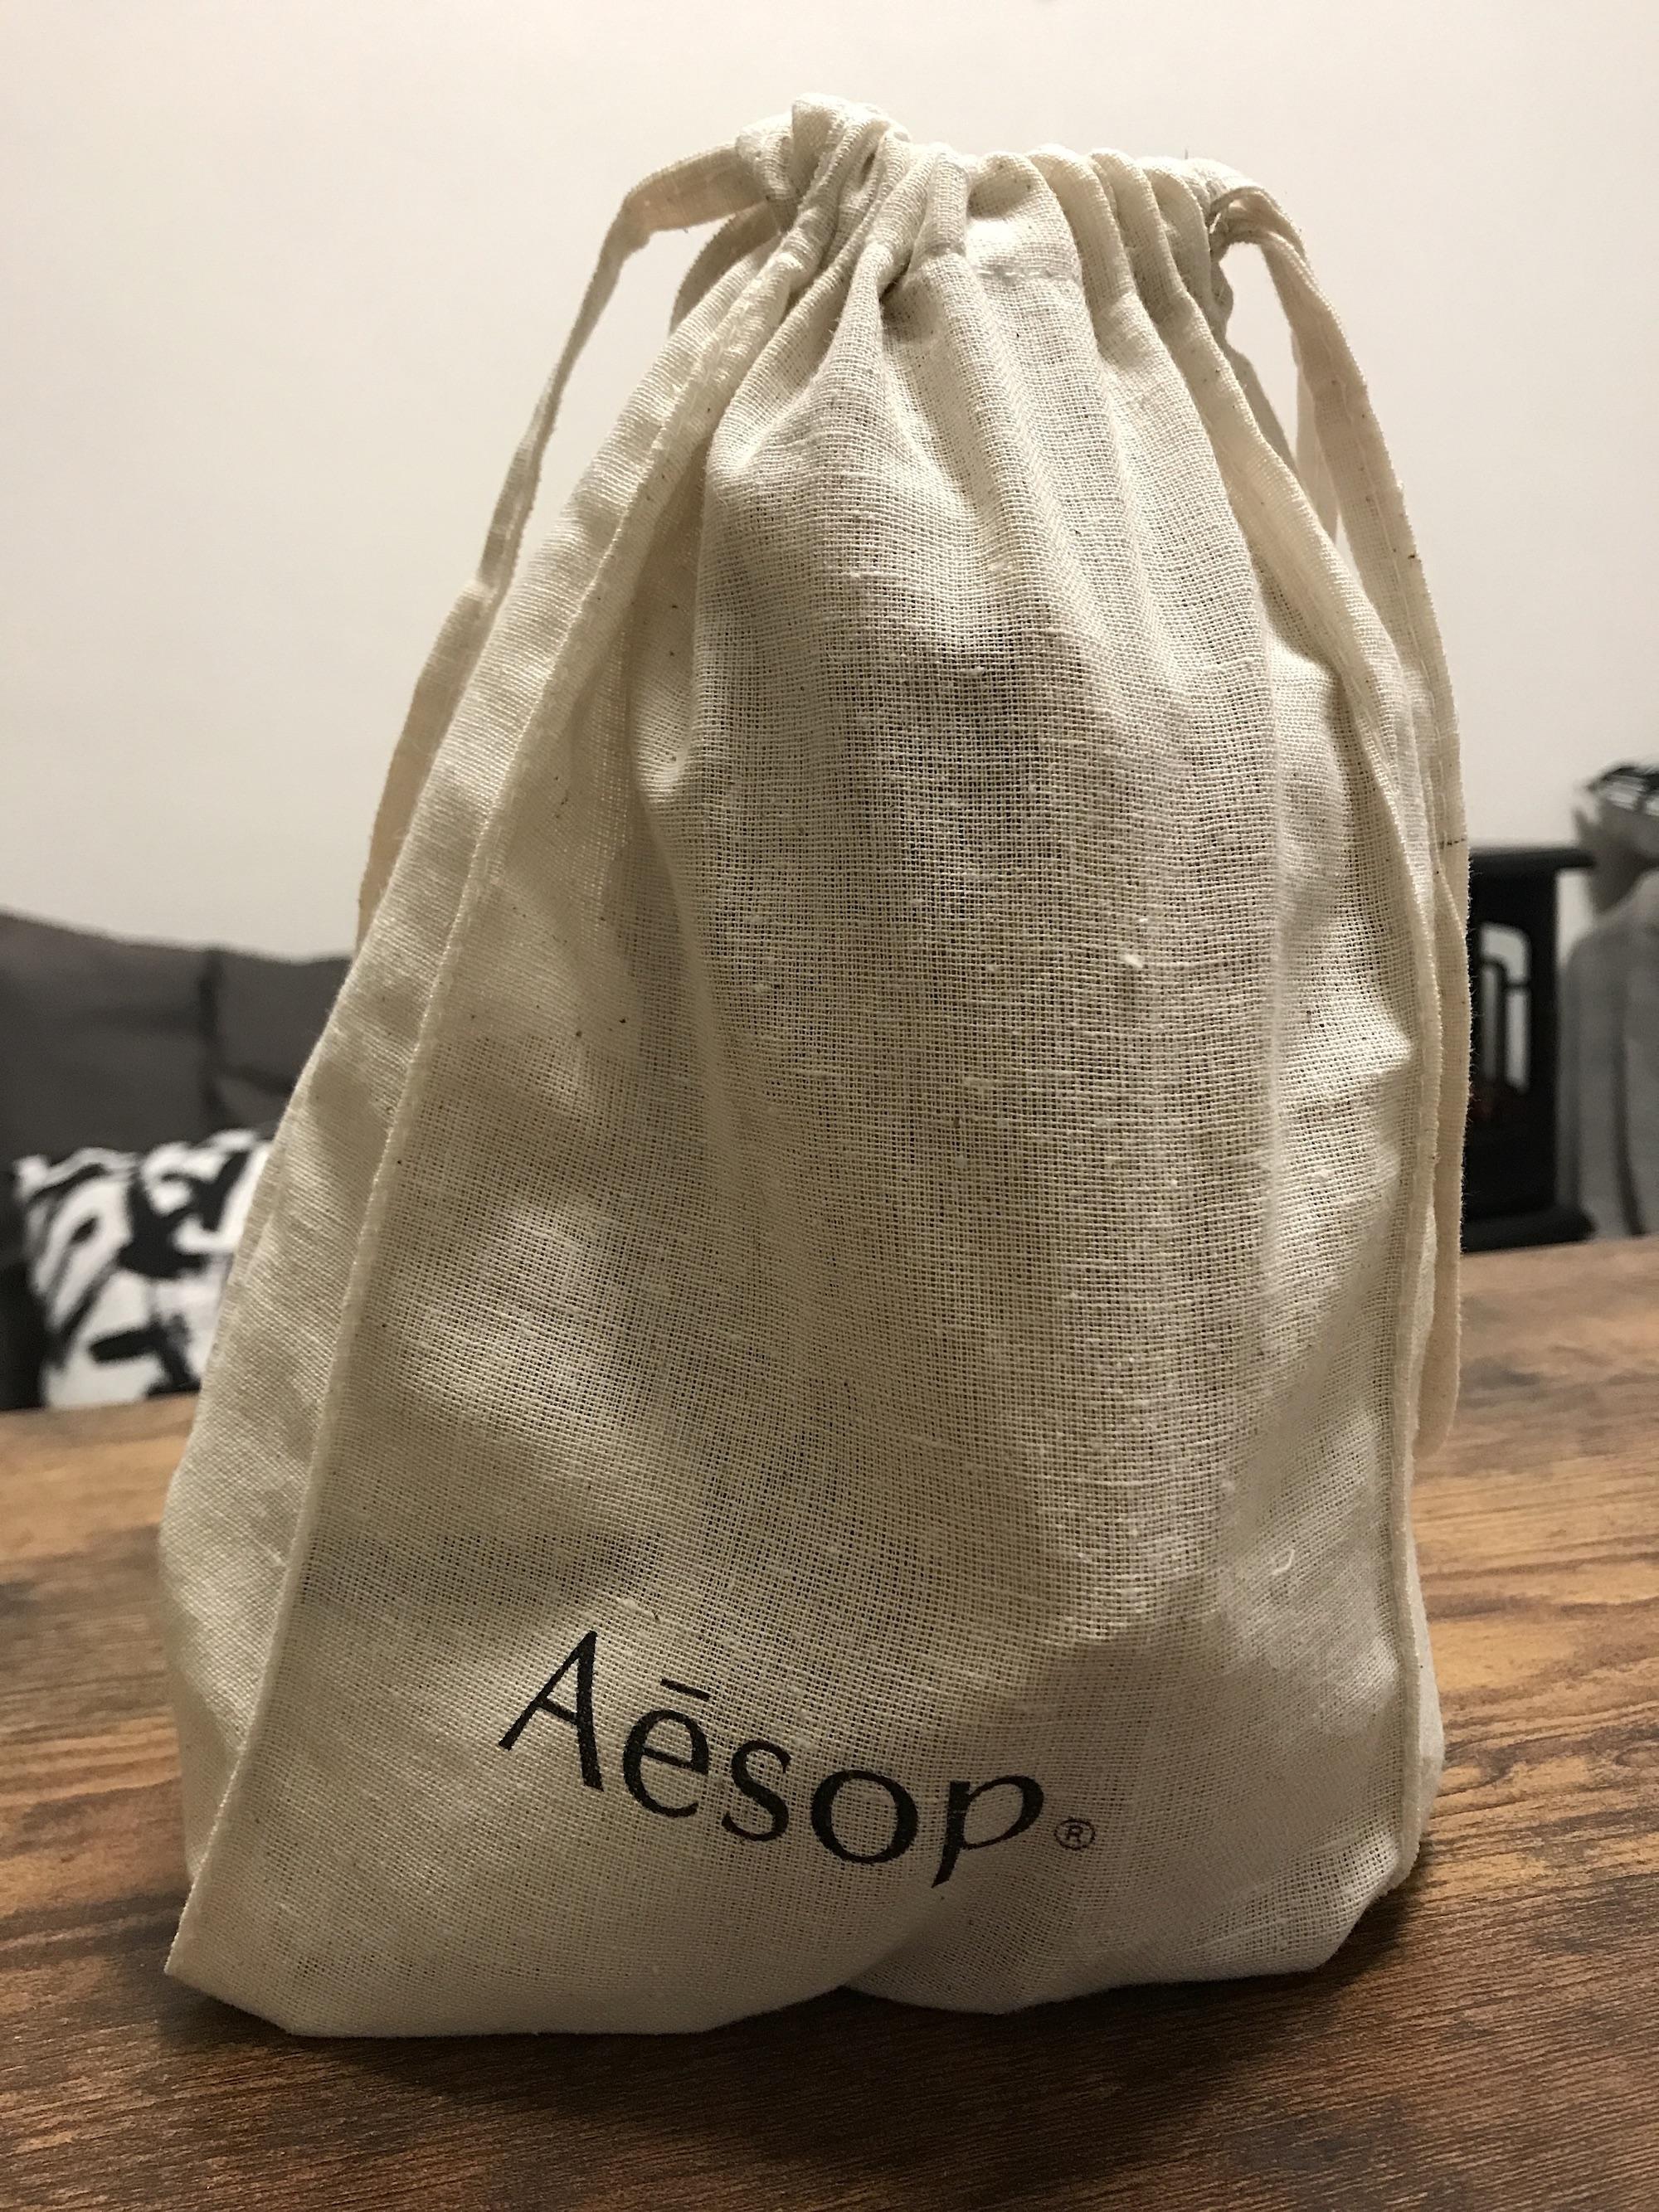 Aesop マウスウォッシュの袋